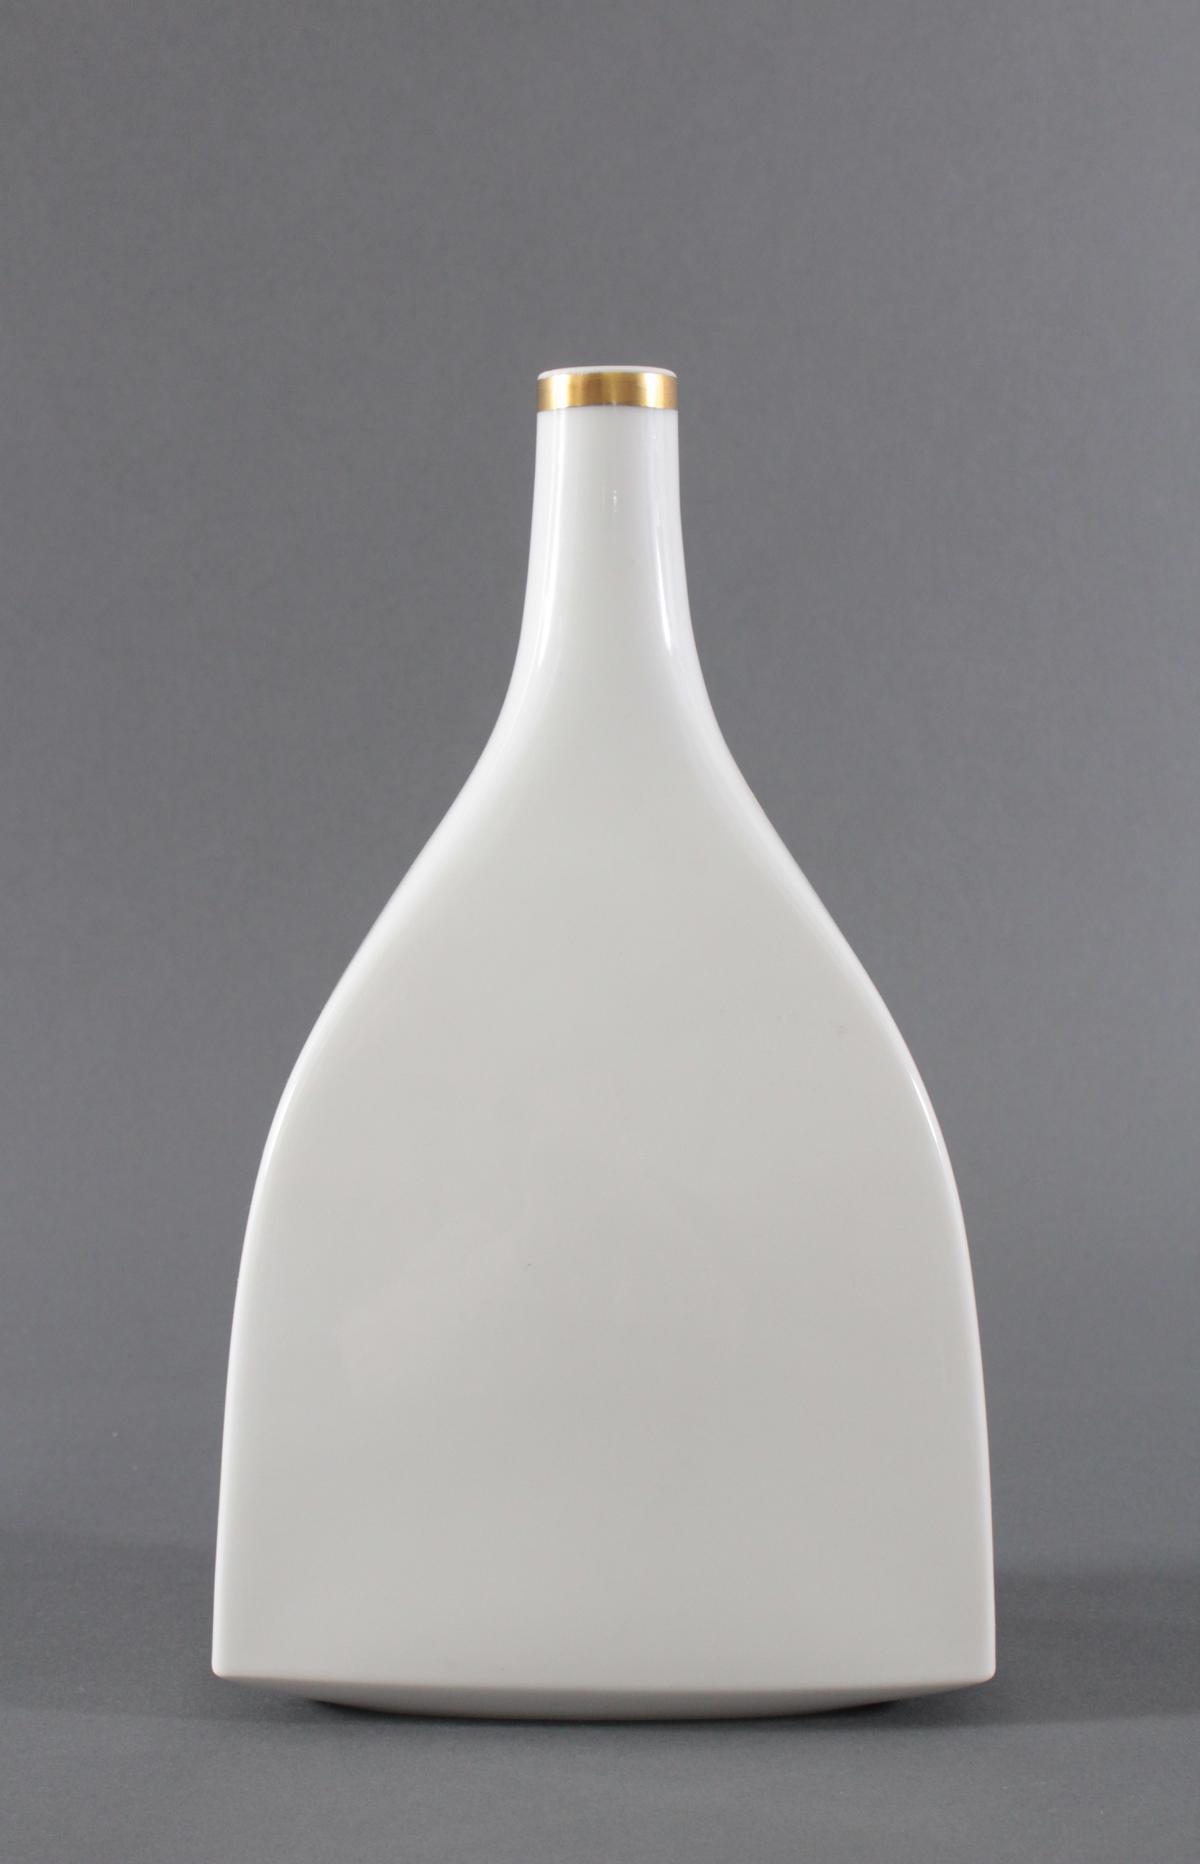 Vase, KPM Berlin, 1. Wahl, Entwurf: Trude Petri-3